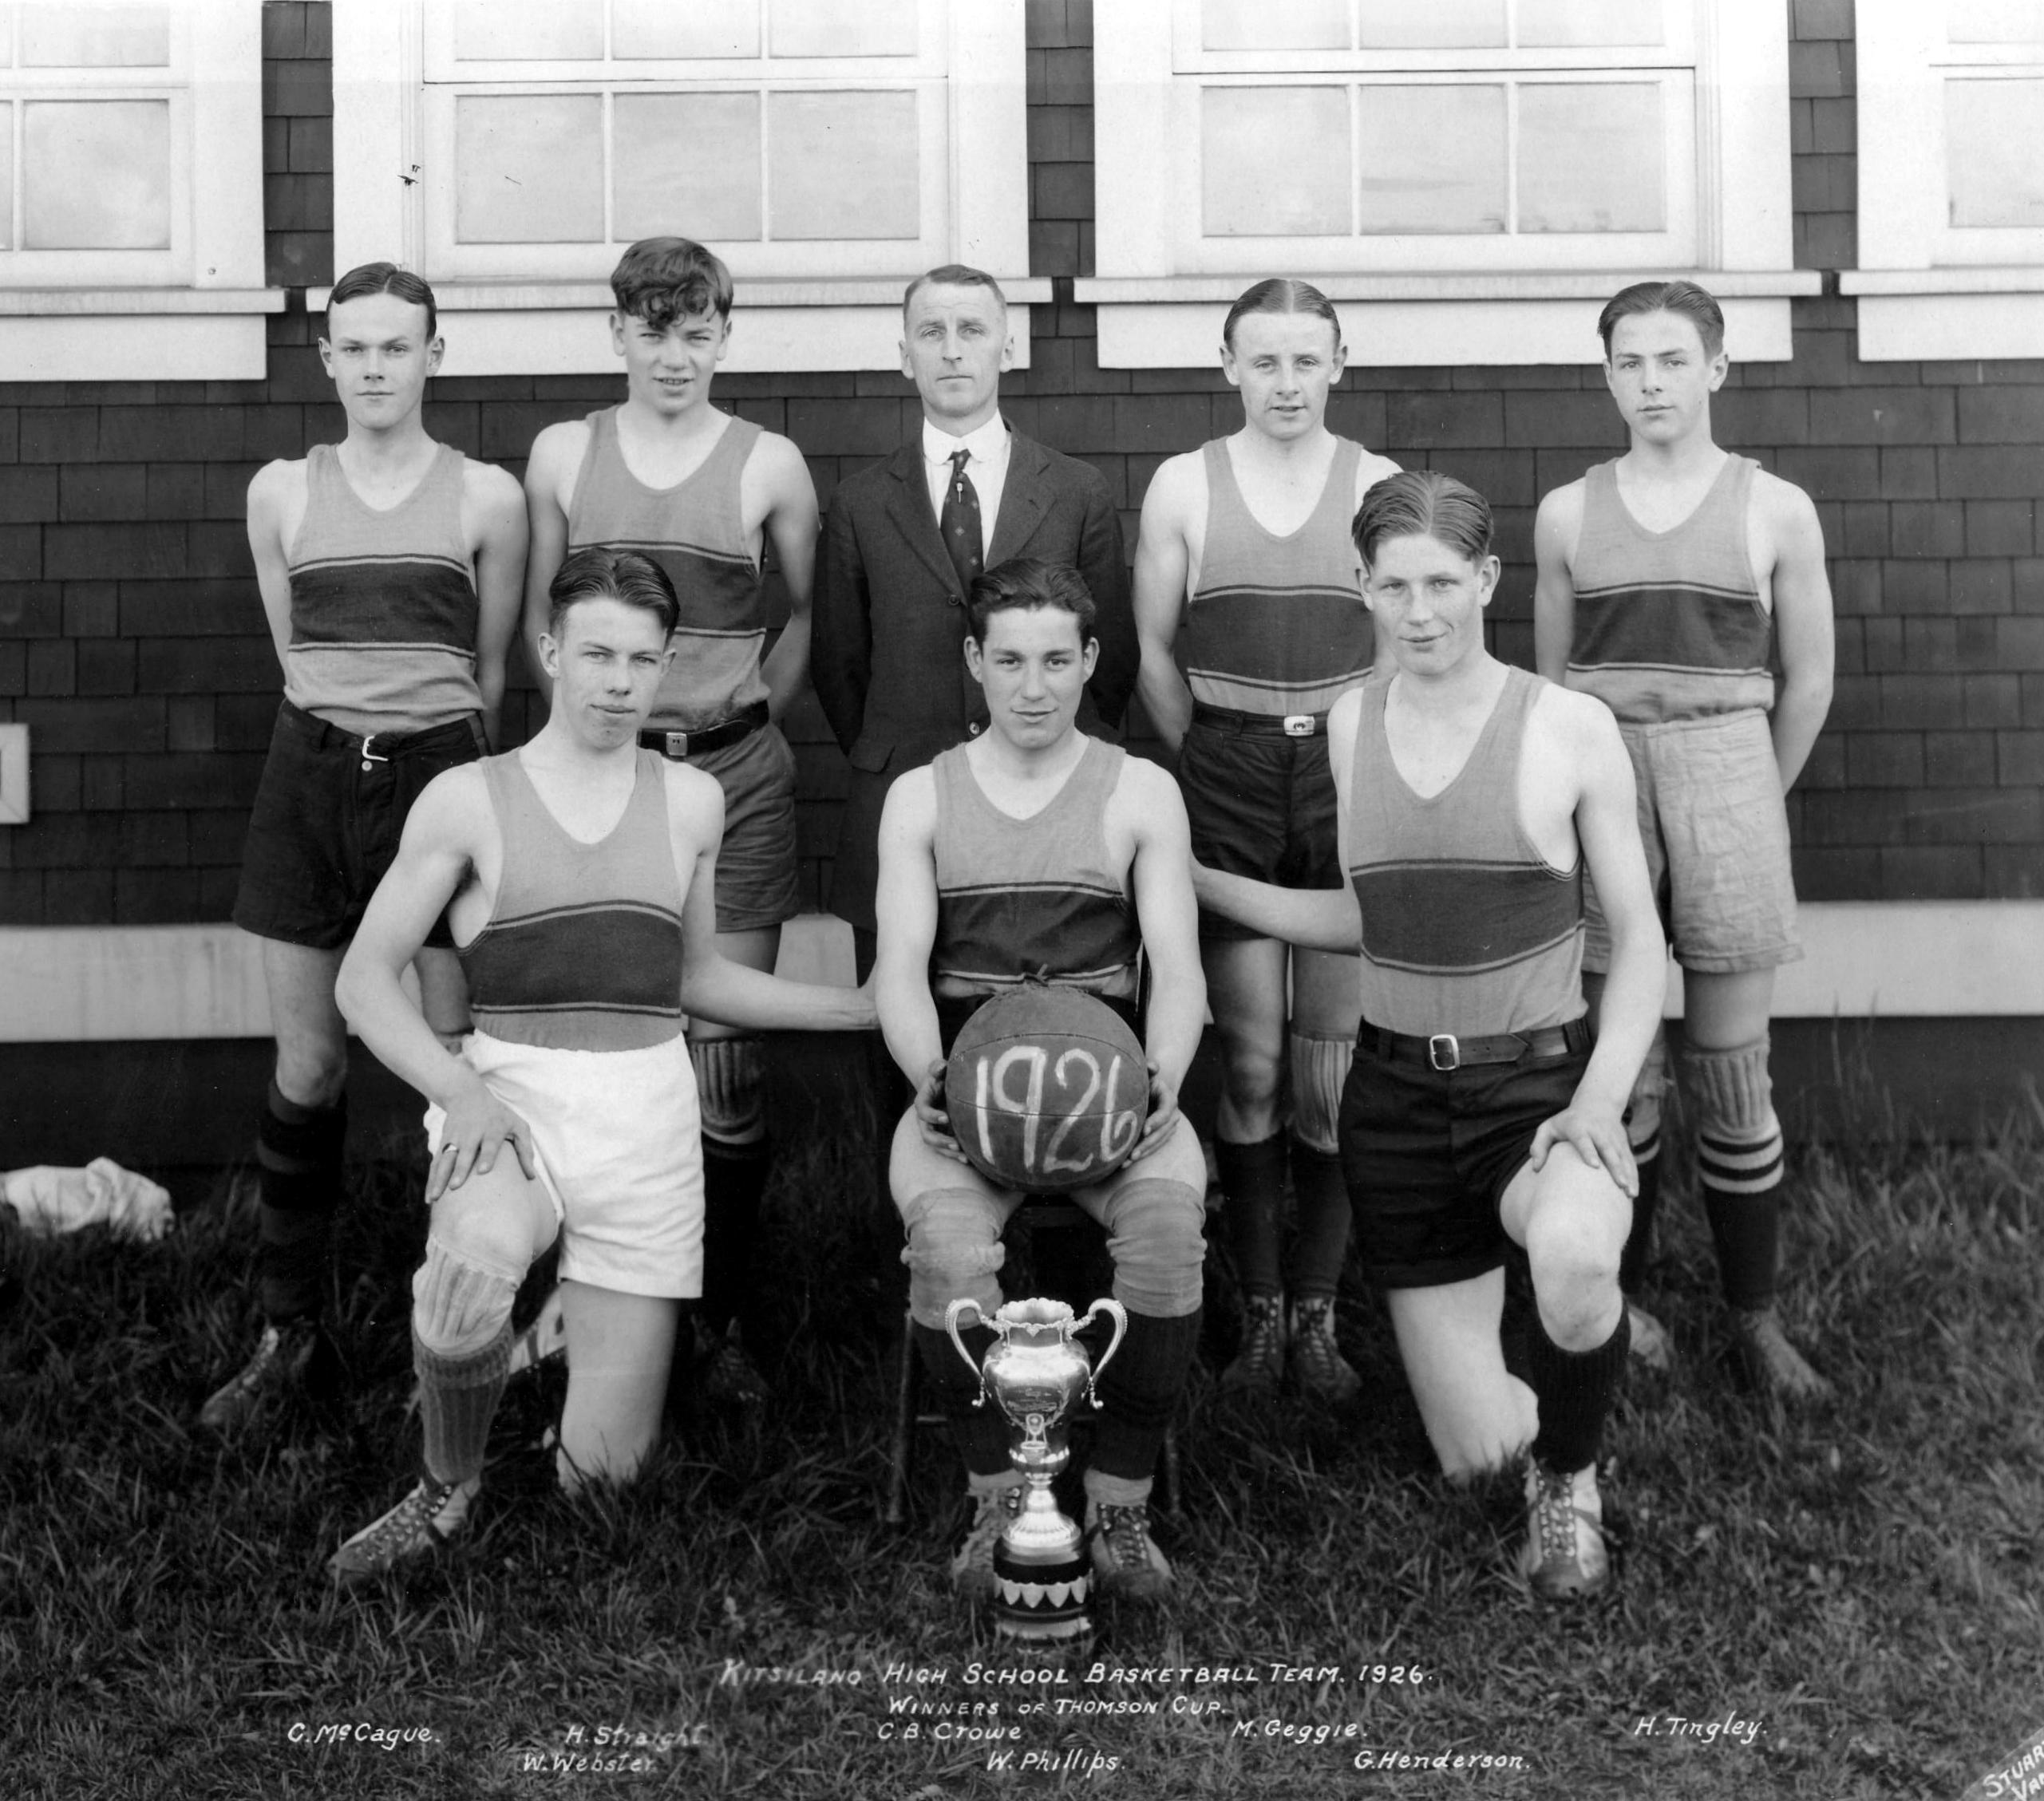 1926boysbasketballteamscan20805